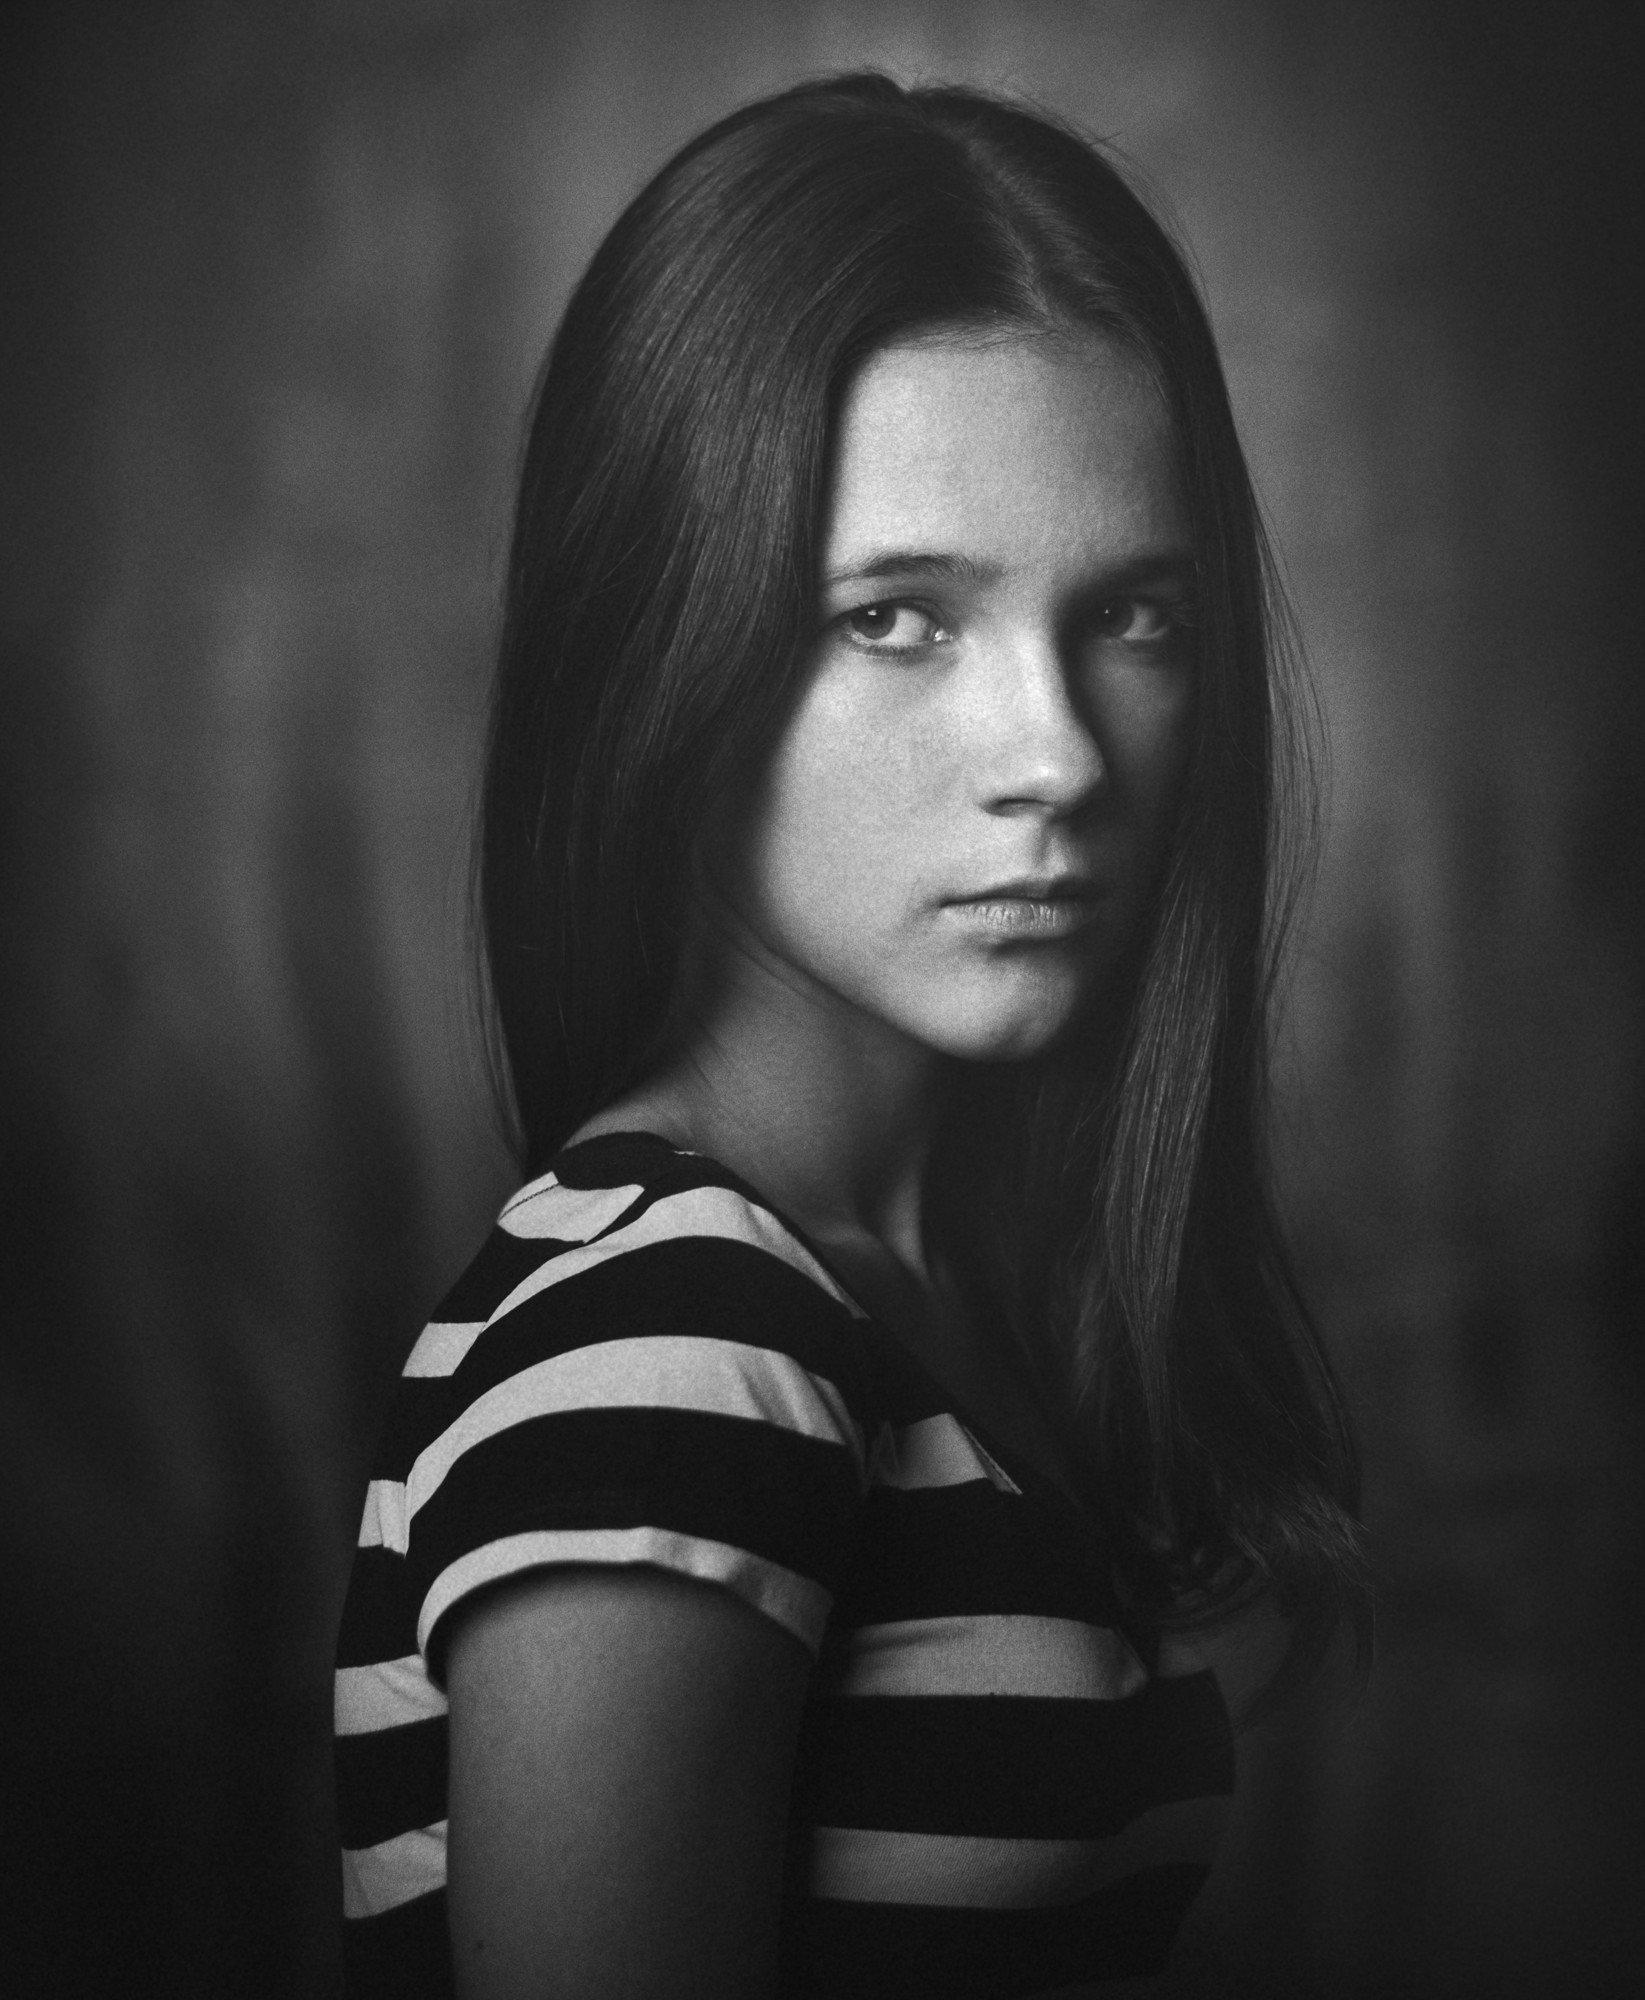 девушка, портрет, взгляд, valeko